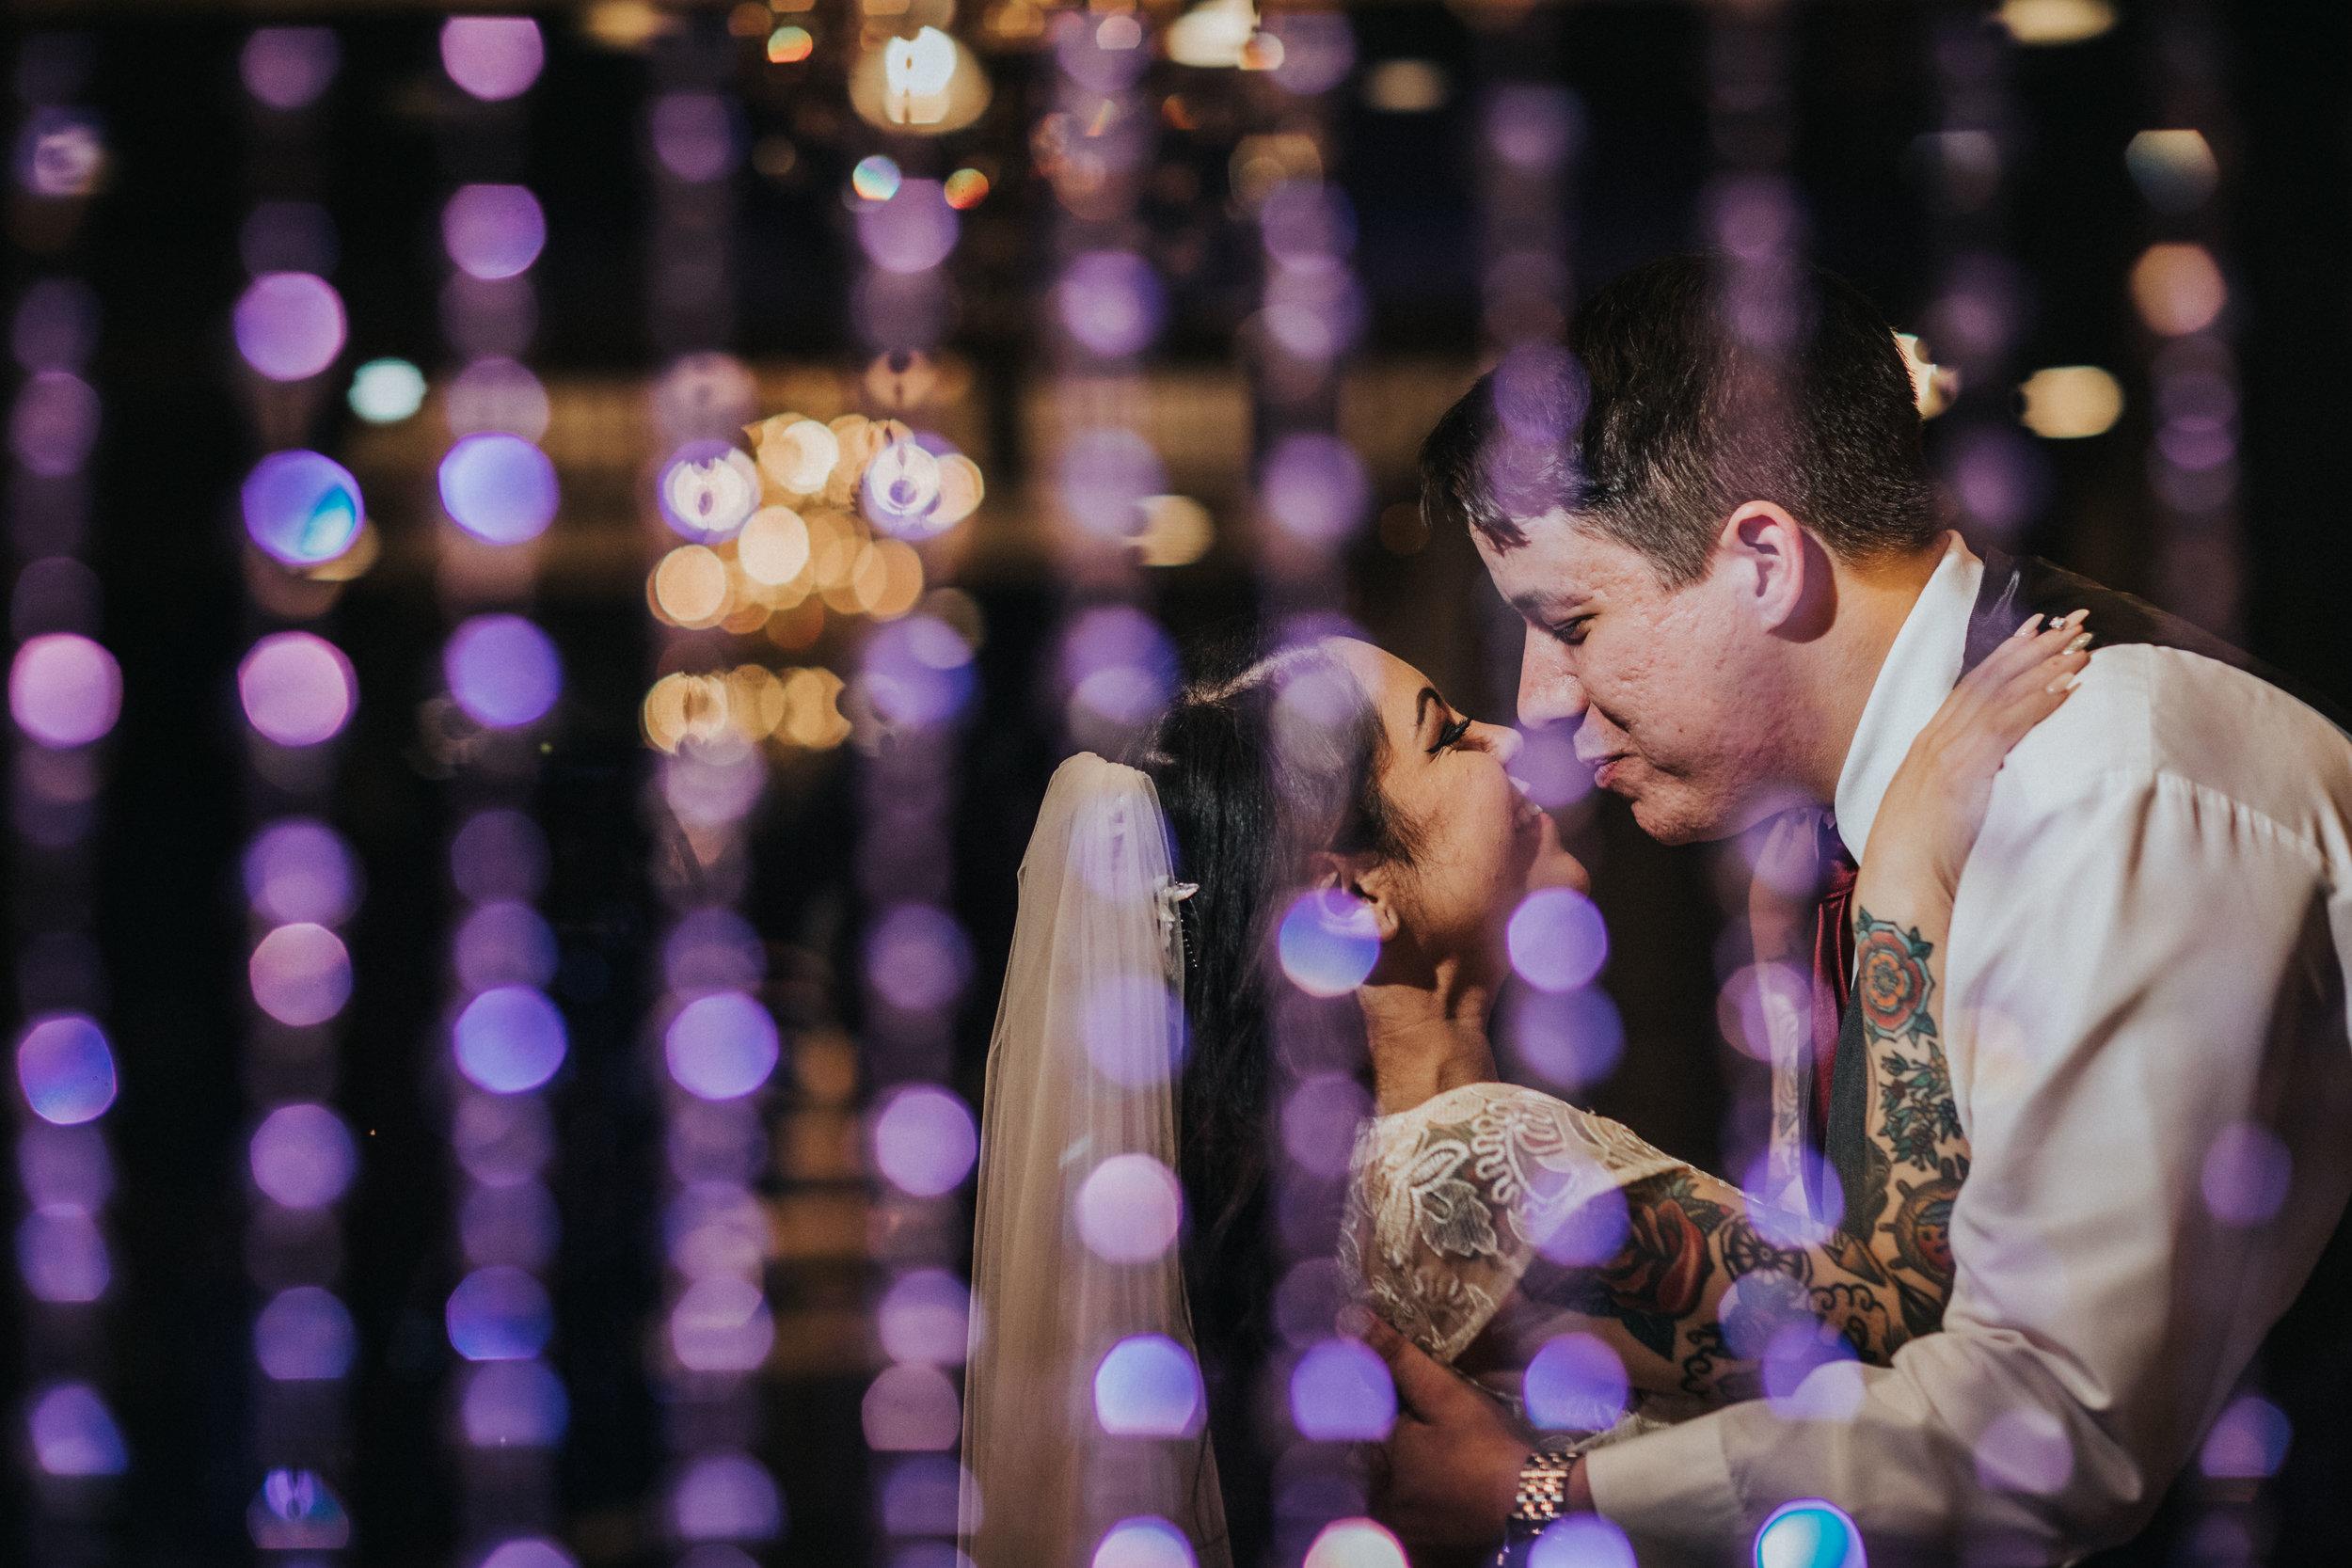 New-Jersey-Wedding-Photographer-ReceptionCenter-Valeria&Mike-First-Look-Bride&Groom (76 of 7).jpg